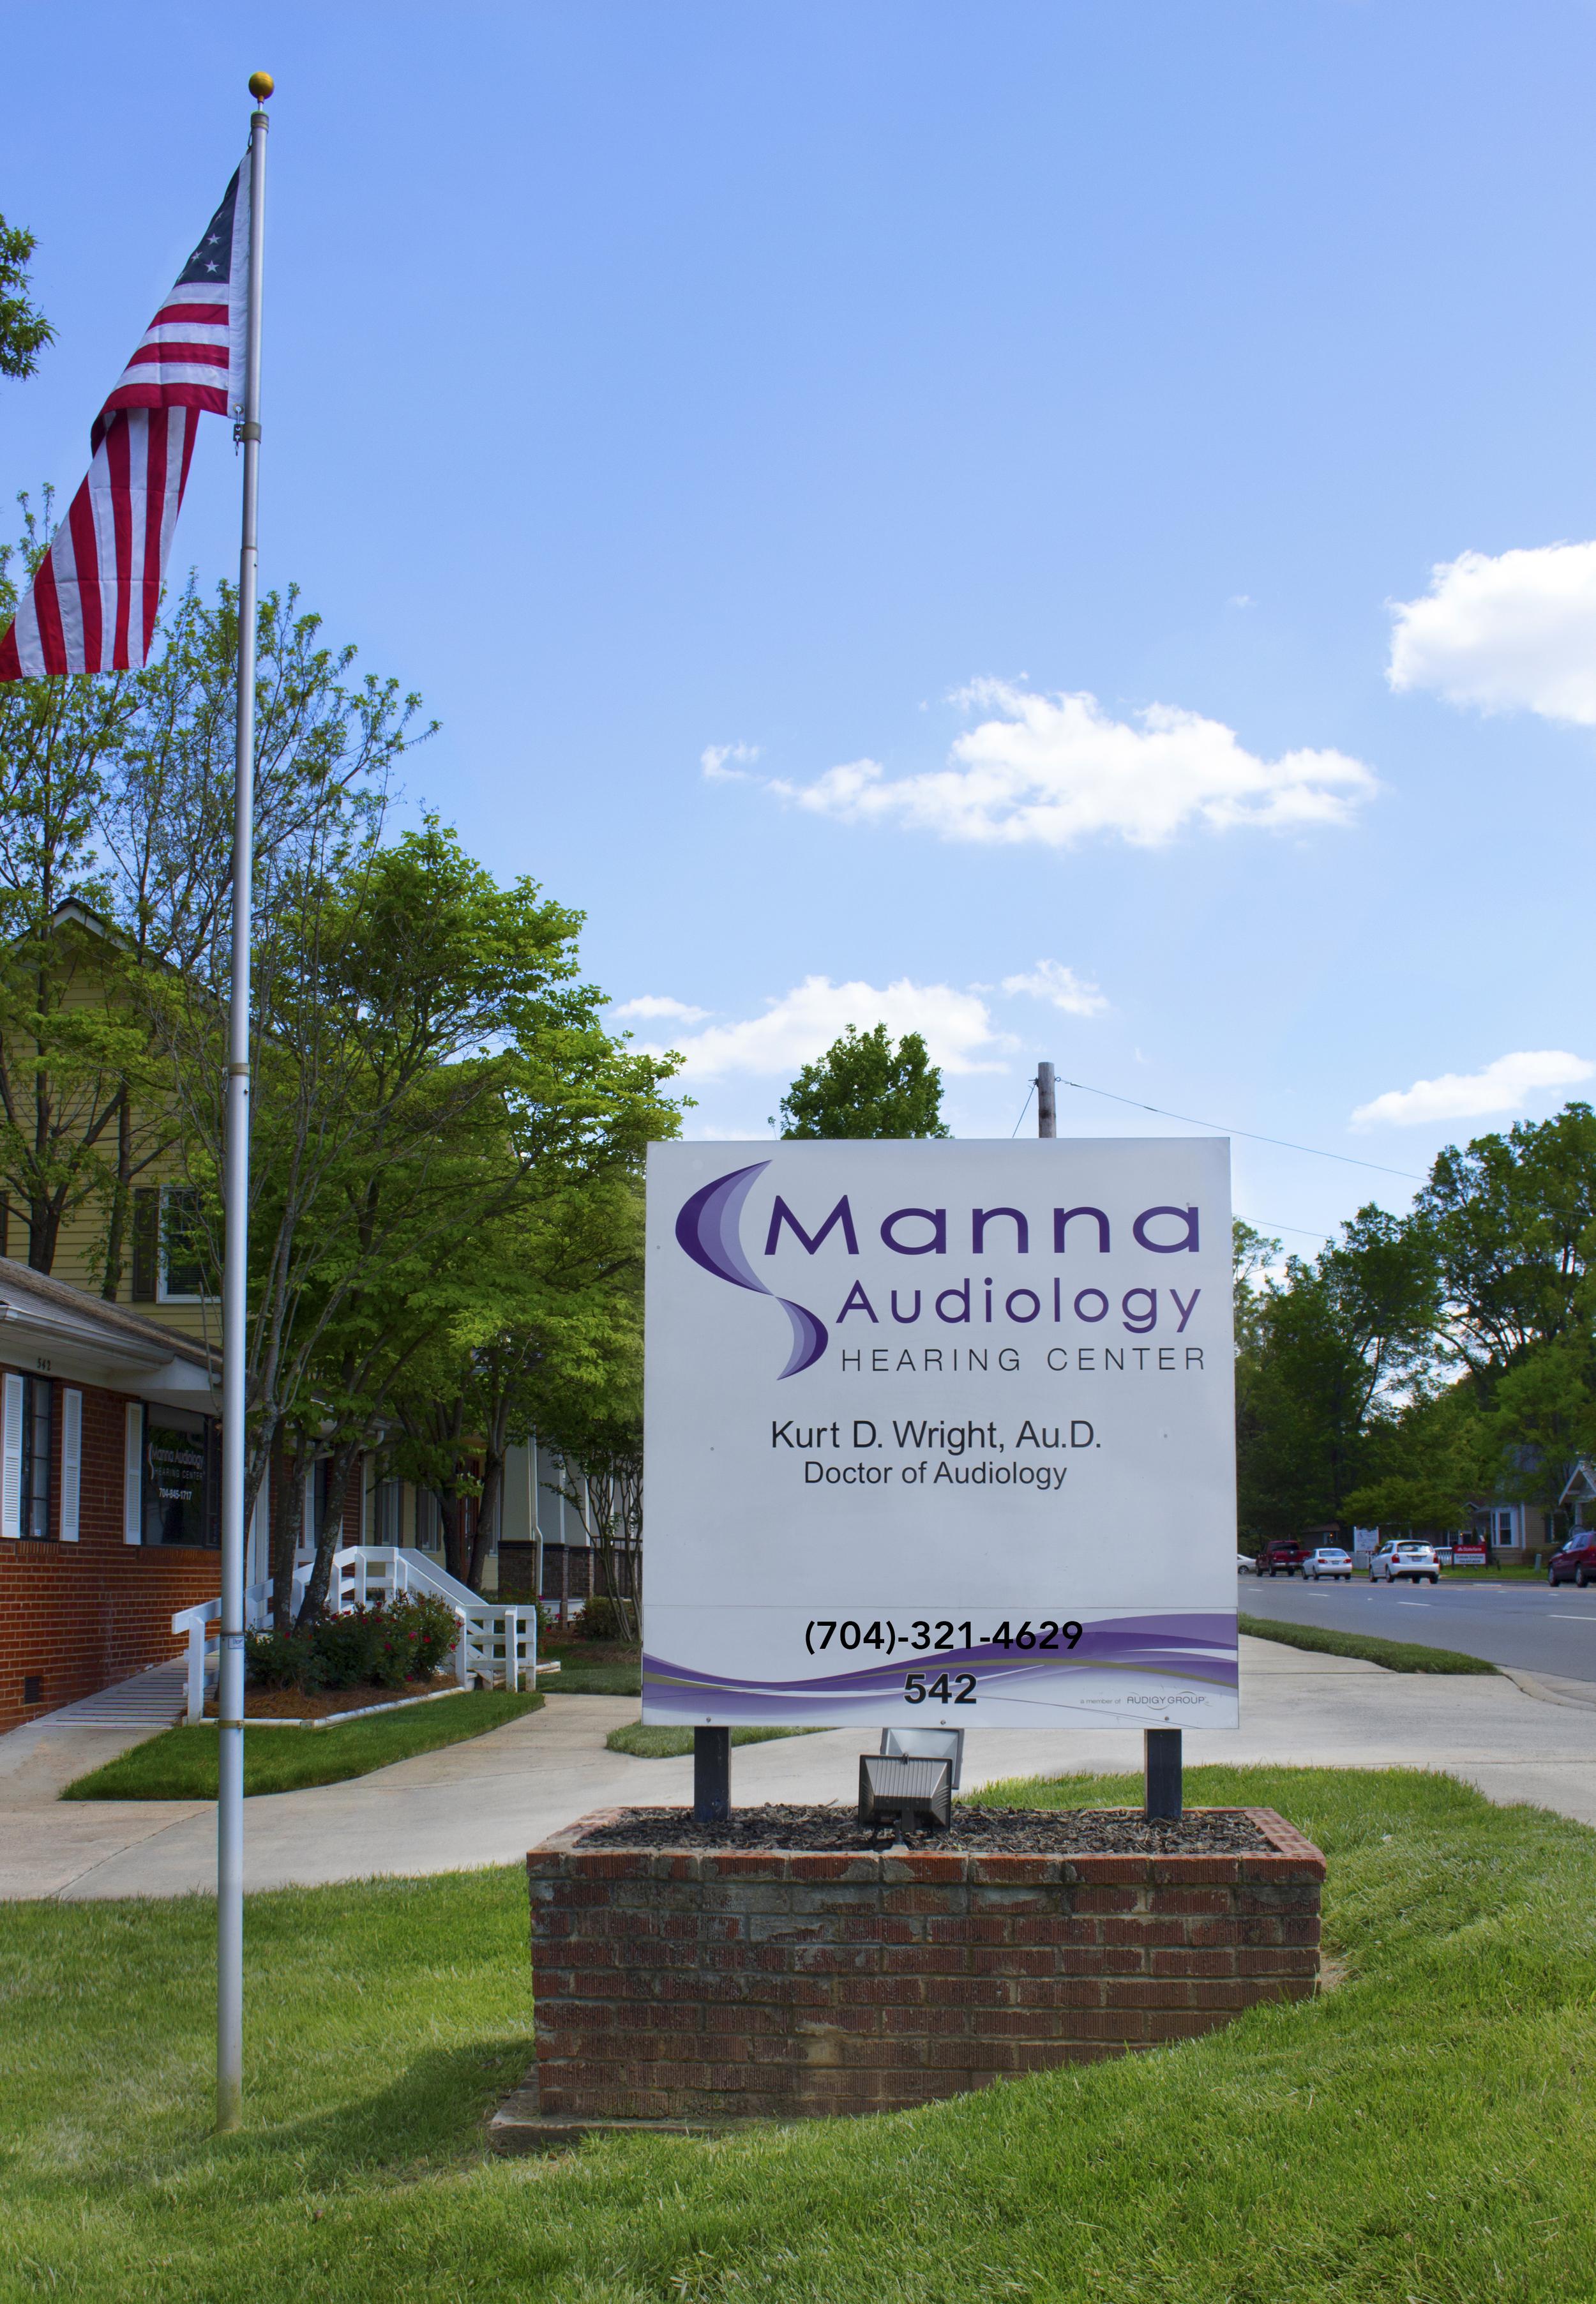 Manna Audiology Front Sign.JPG